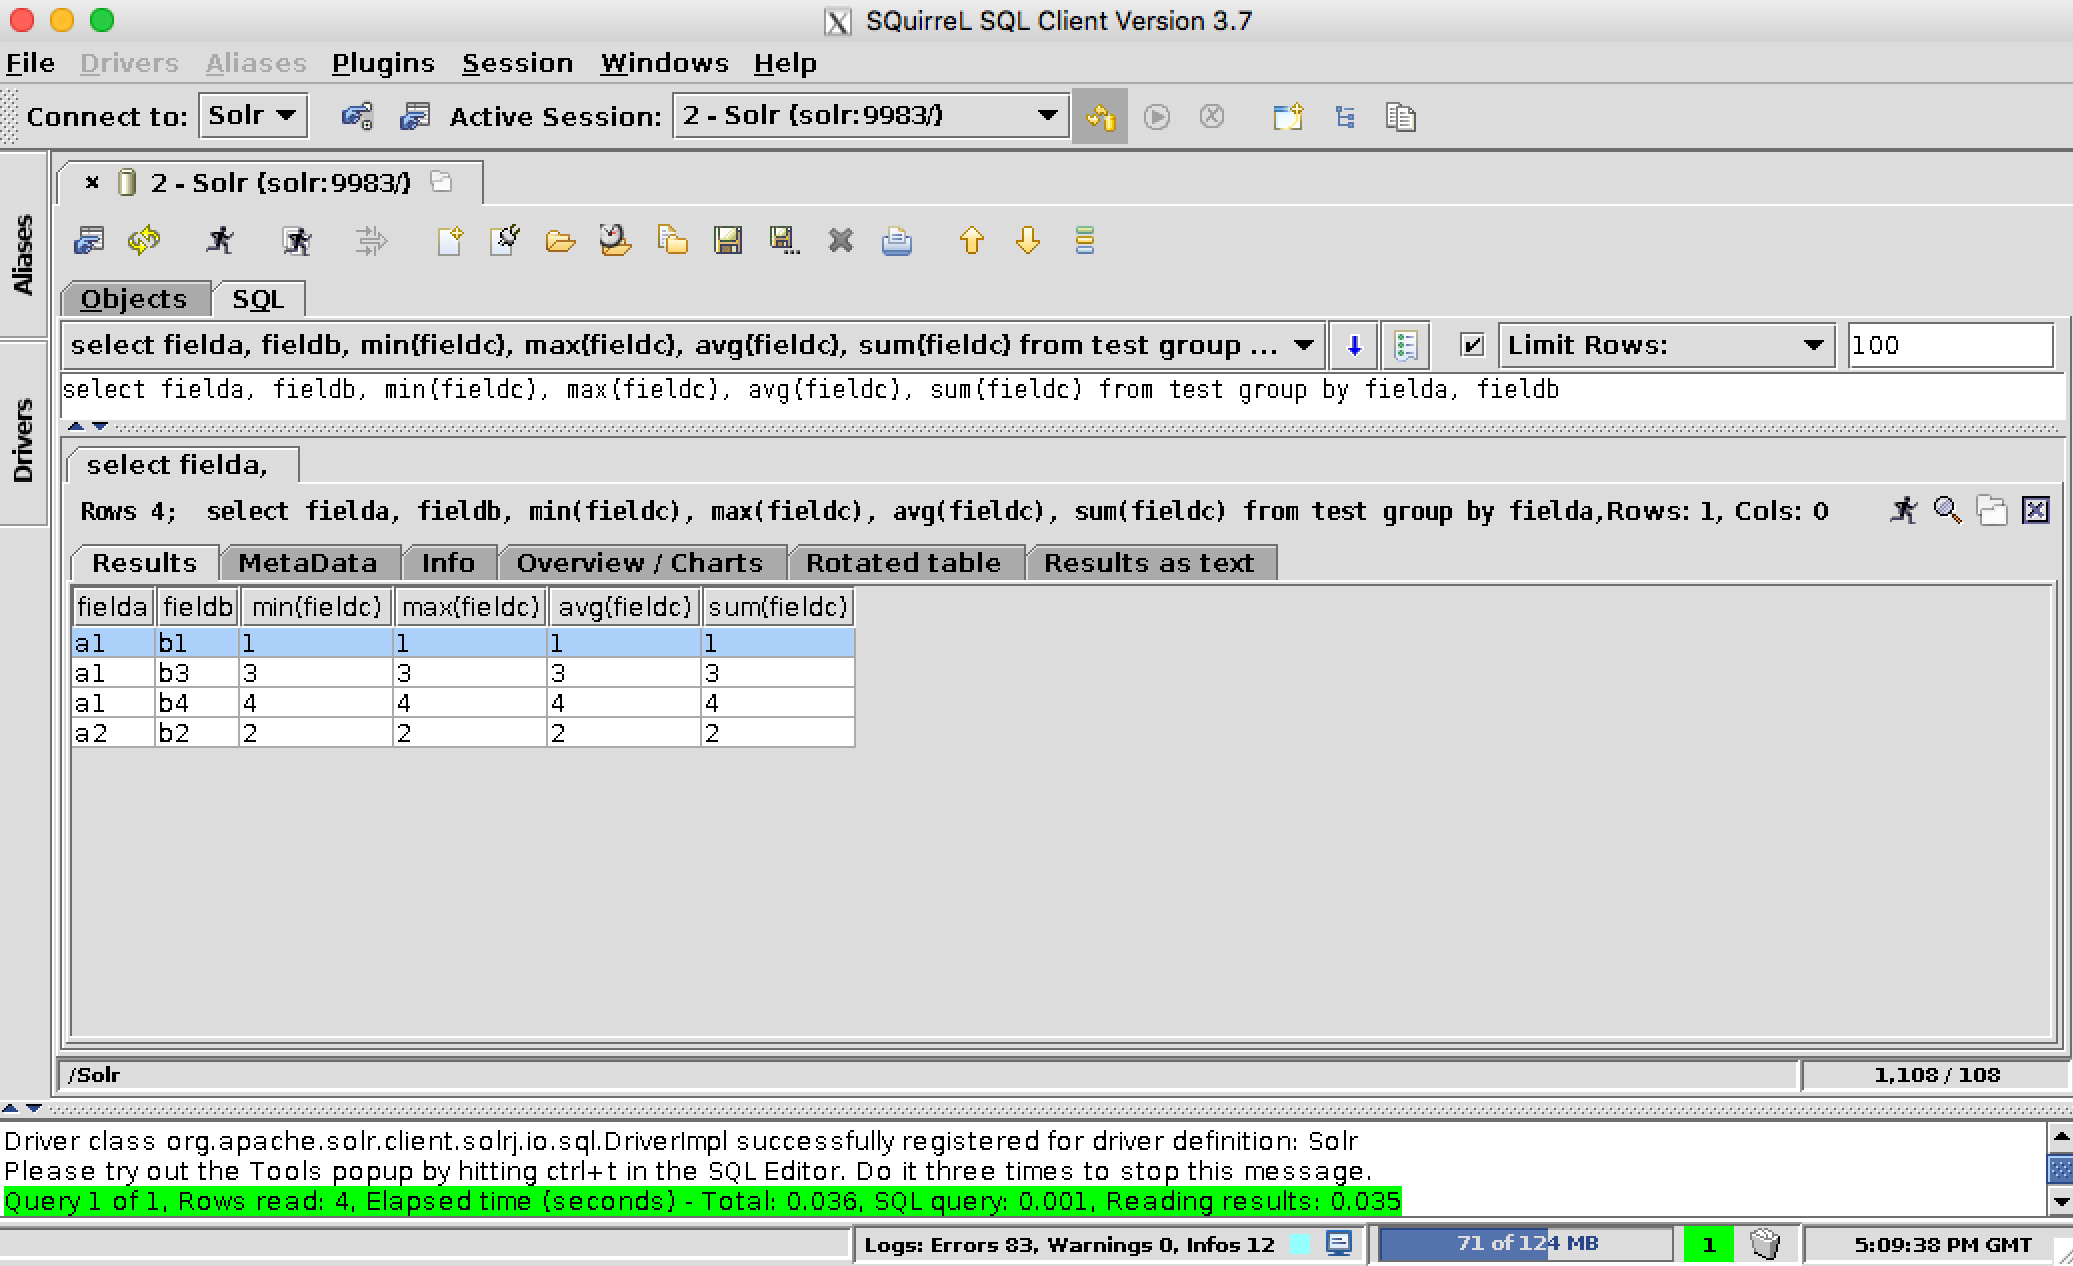 Updating a row in sql using jdbc